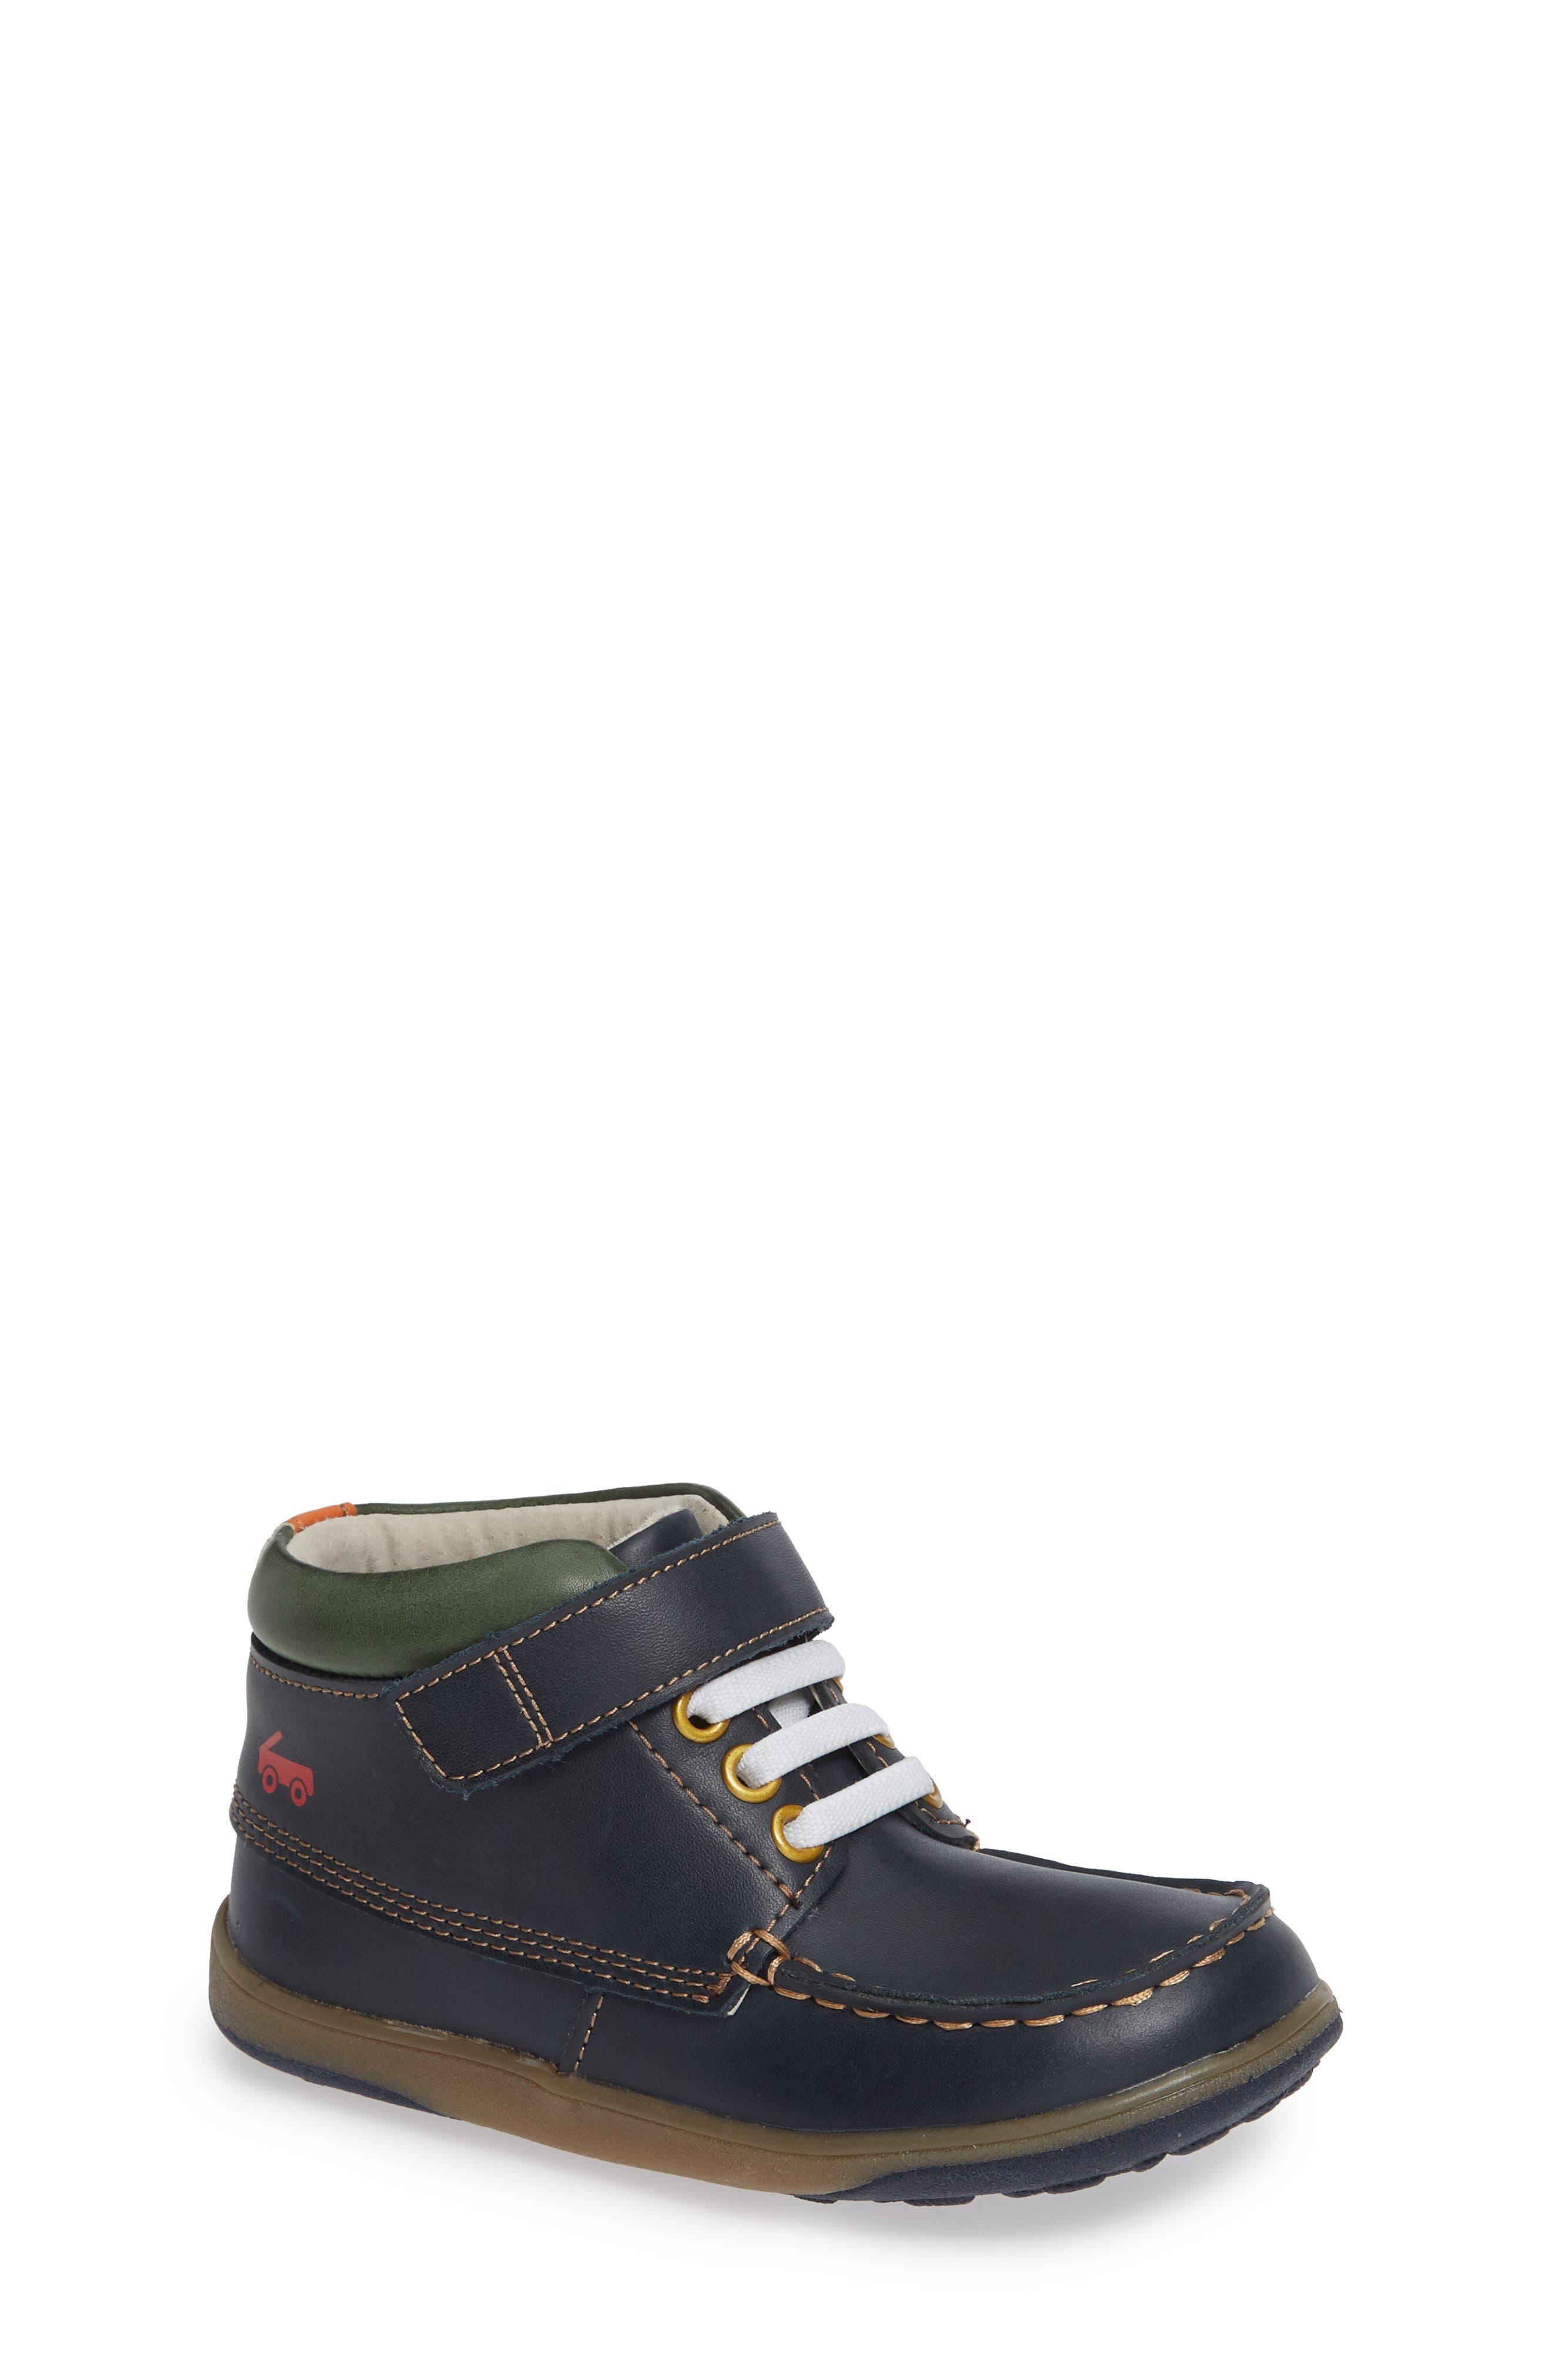 Owen High Top Sneaker Bootie,                             Main thumbnail 1, color,                             NAVY